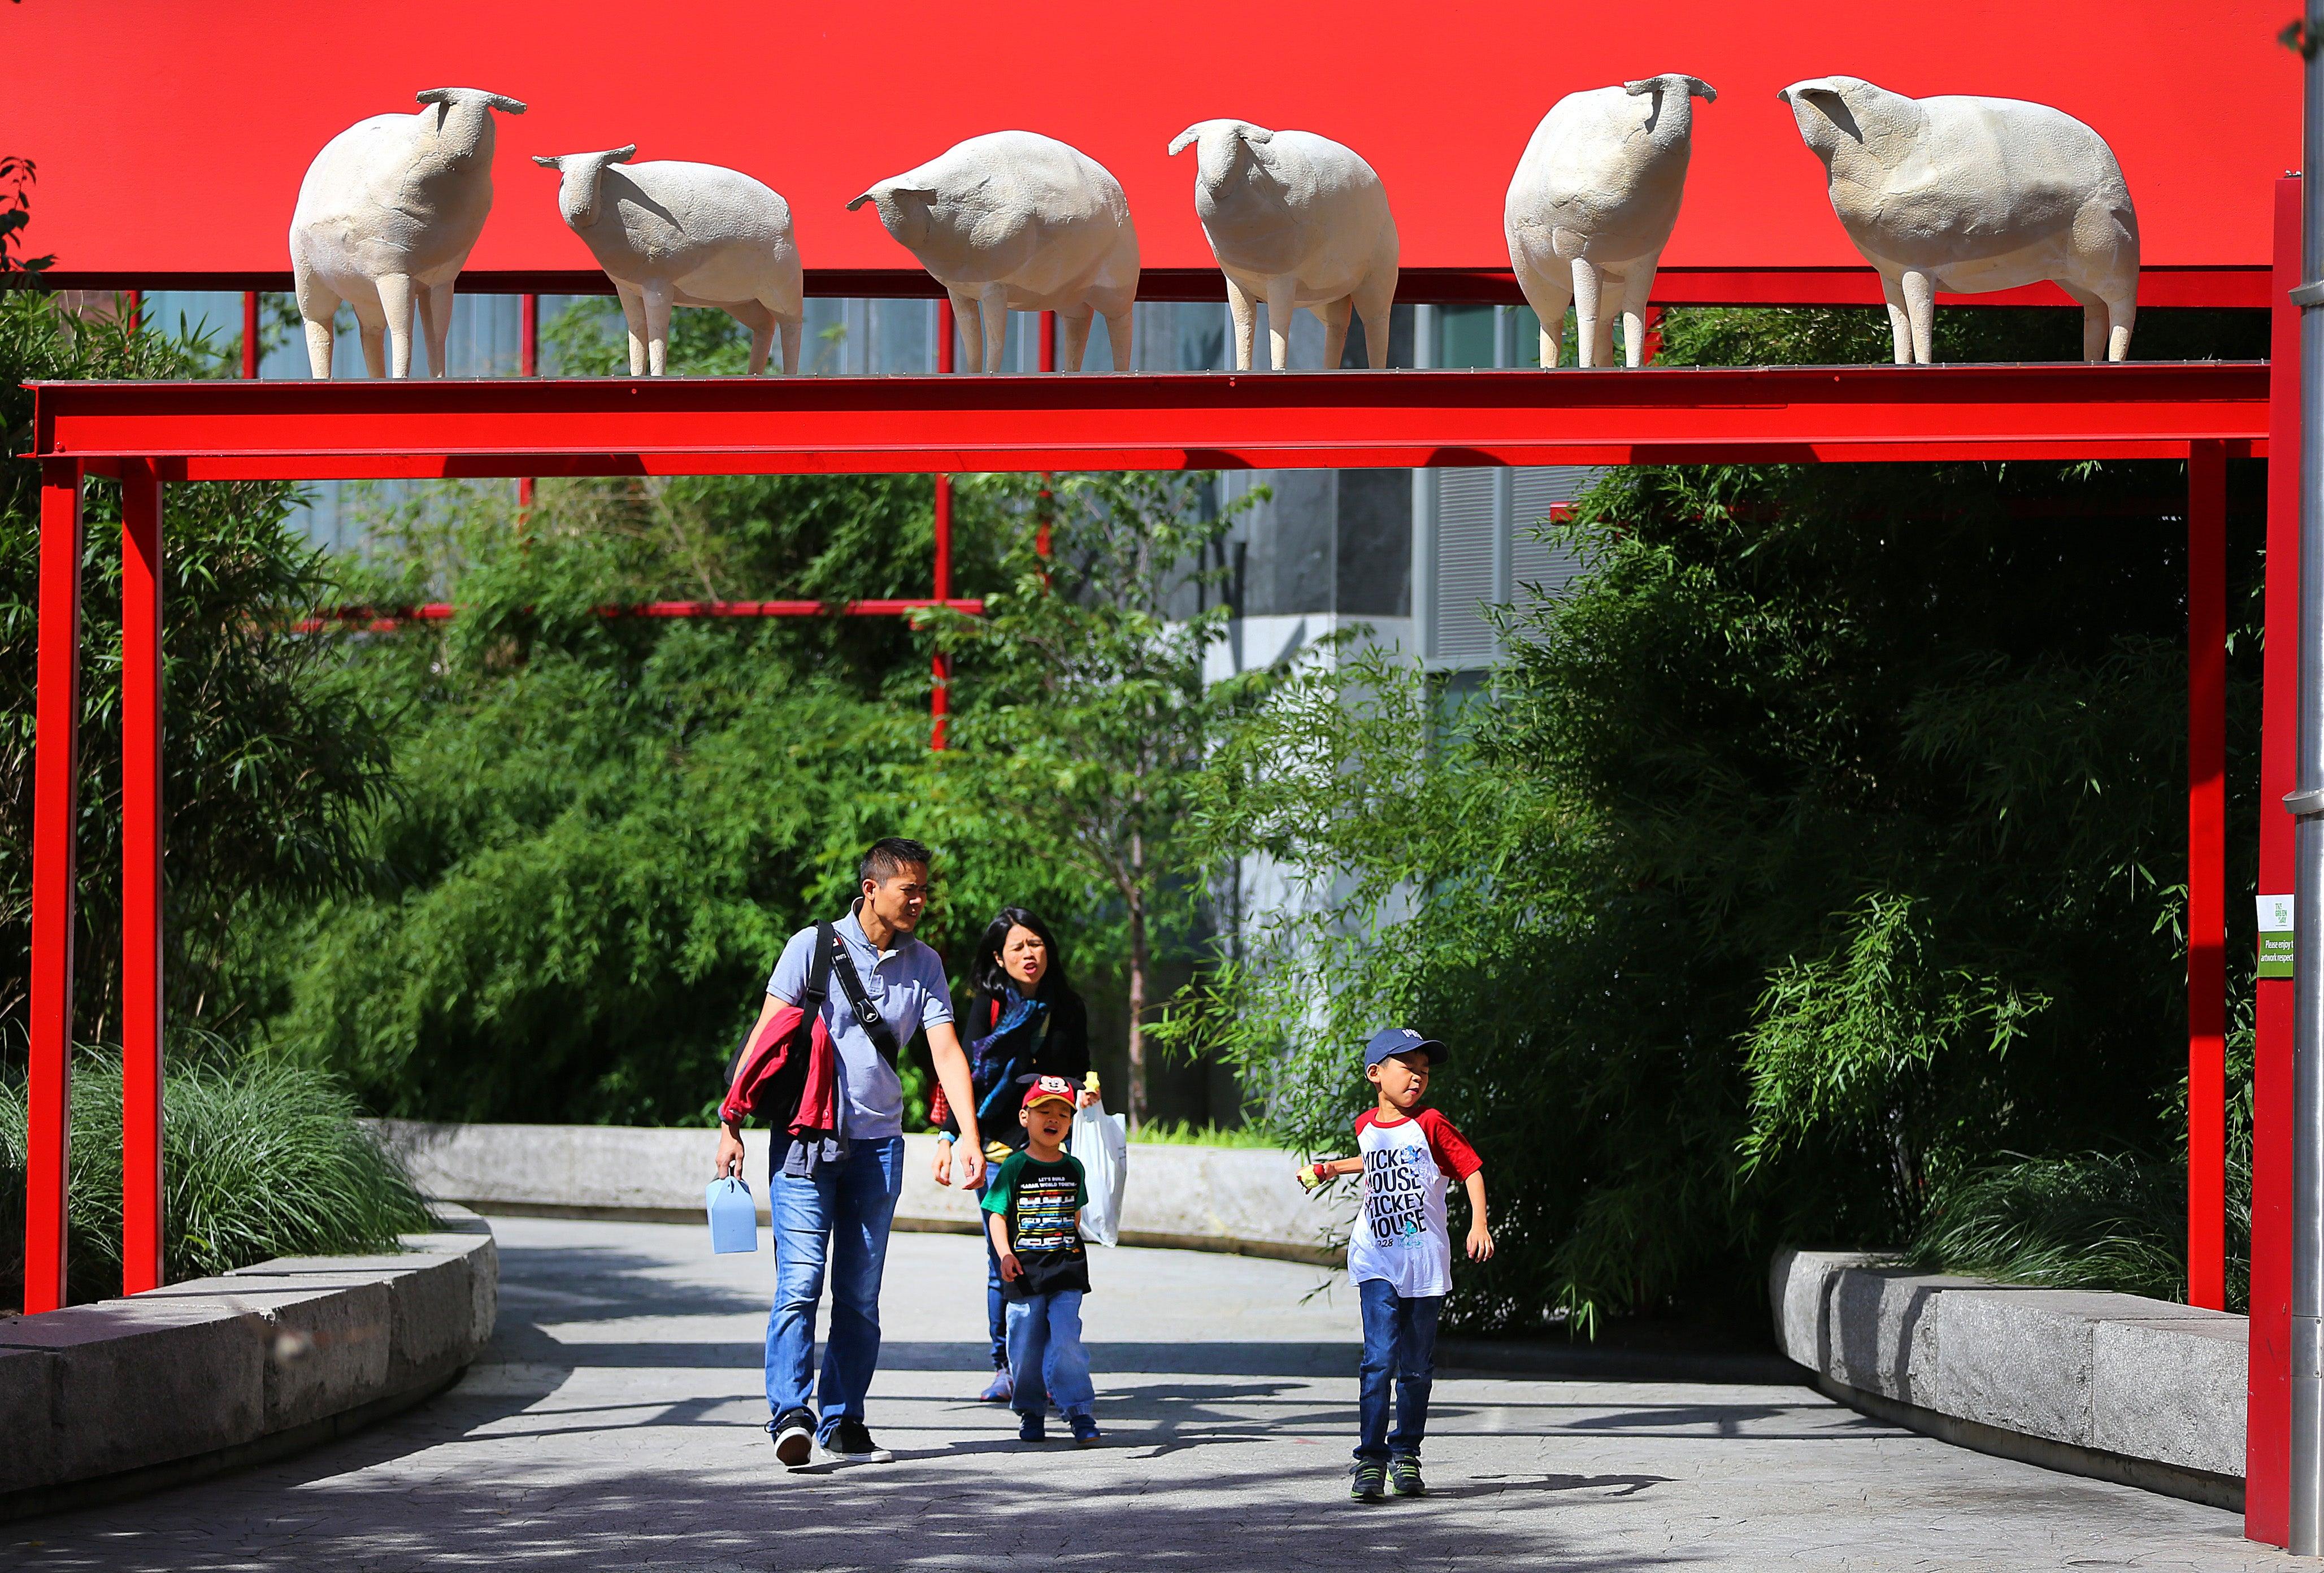 Boston--07/25/15 The Chinatown Wandering Sheep sculpture at Chinatown Park.Globe staff photo by (arts)